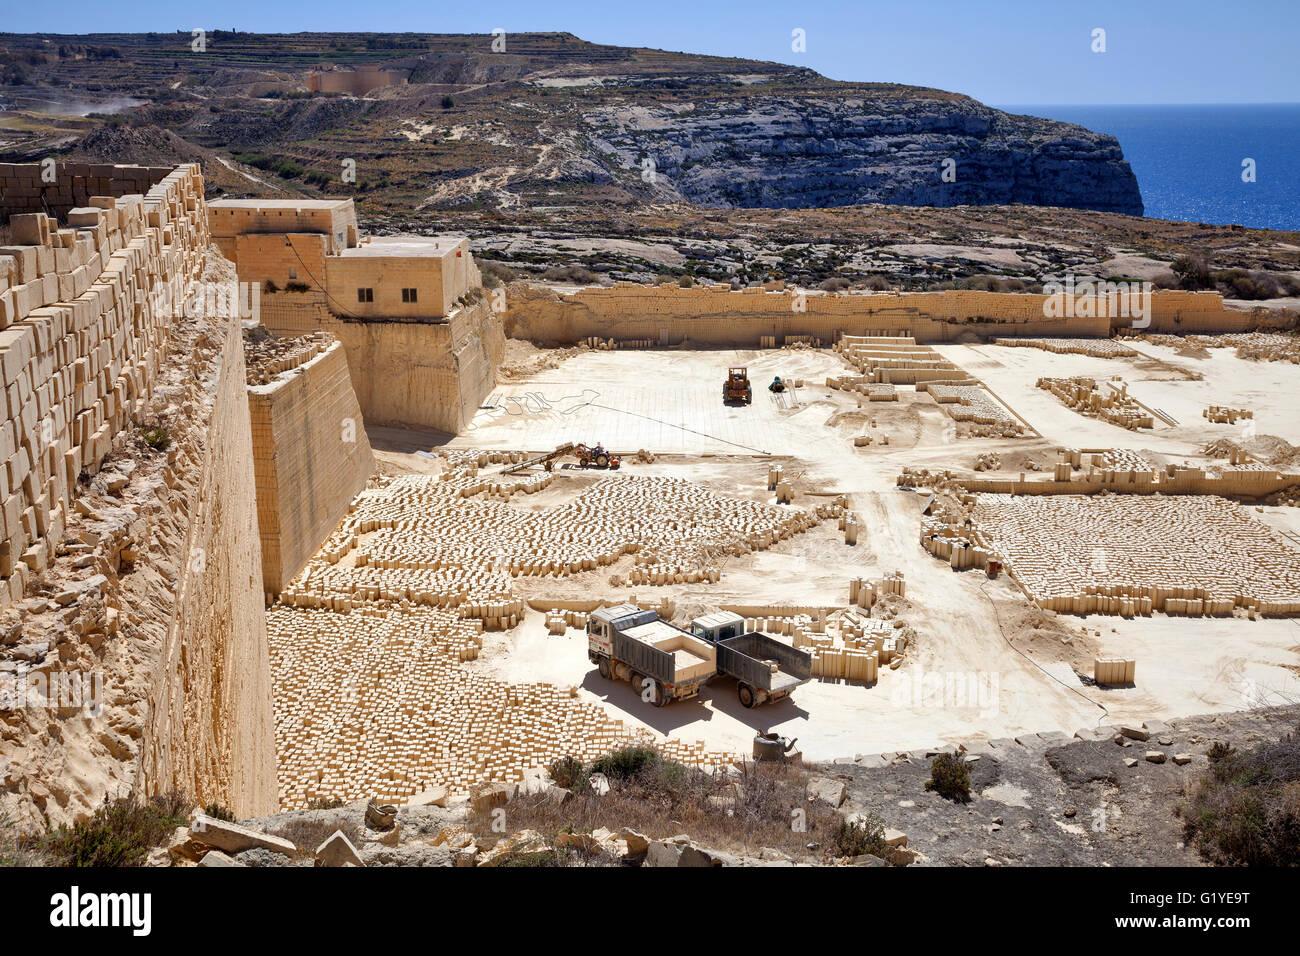 Wild Leek Flowers With Gozo Island Limestone Cliffs In The ...   Gozo Limestone